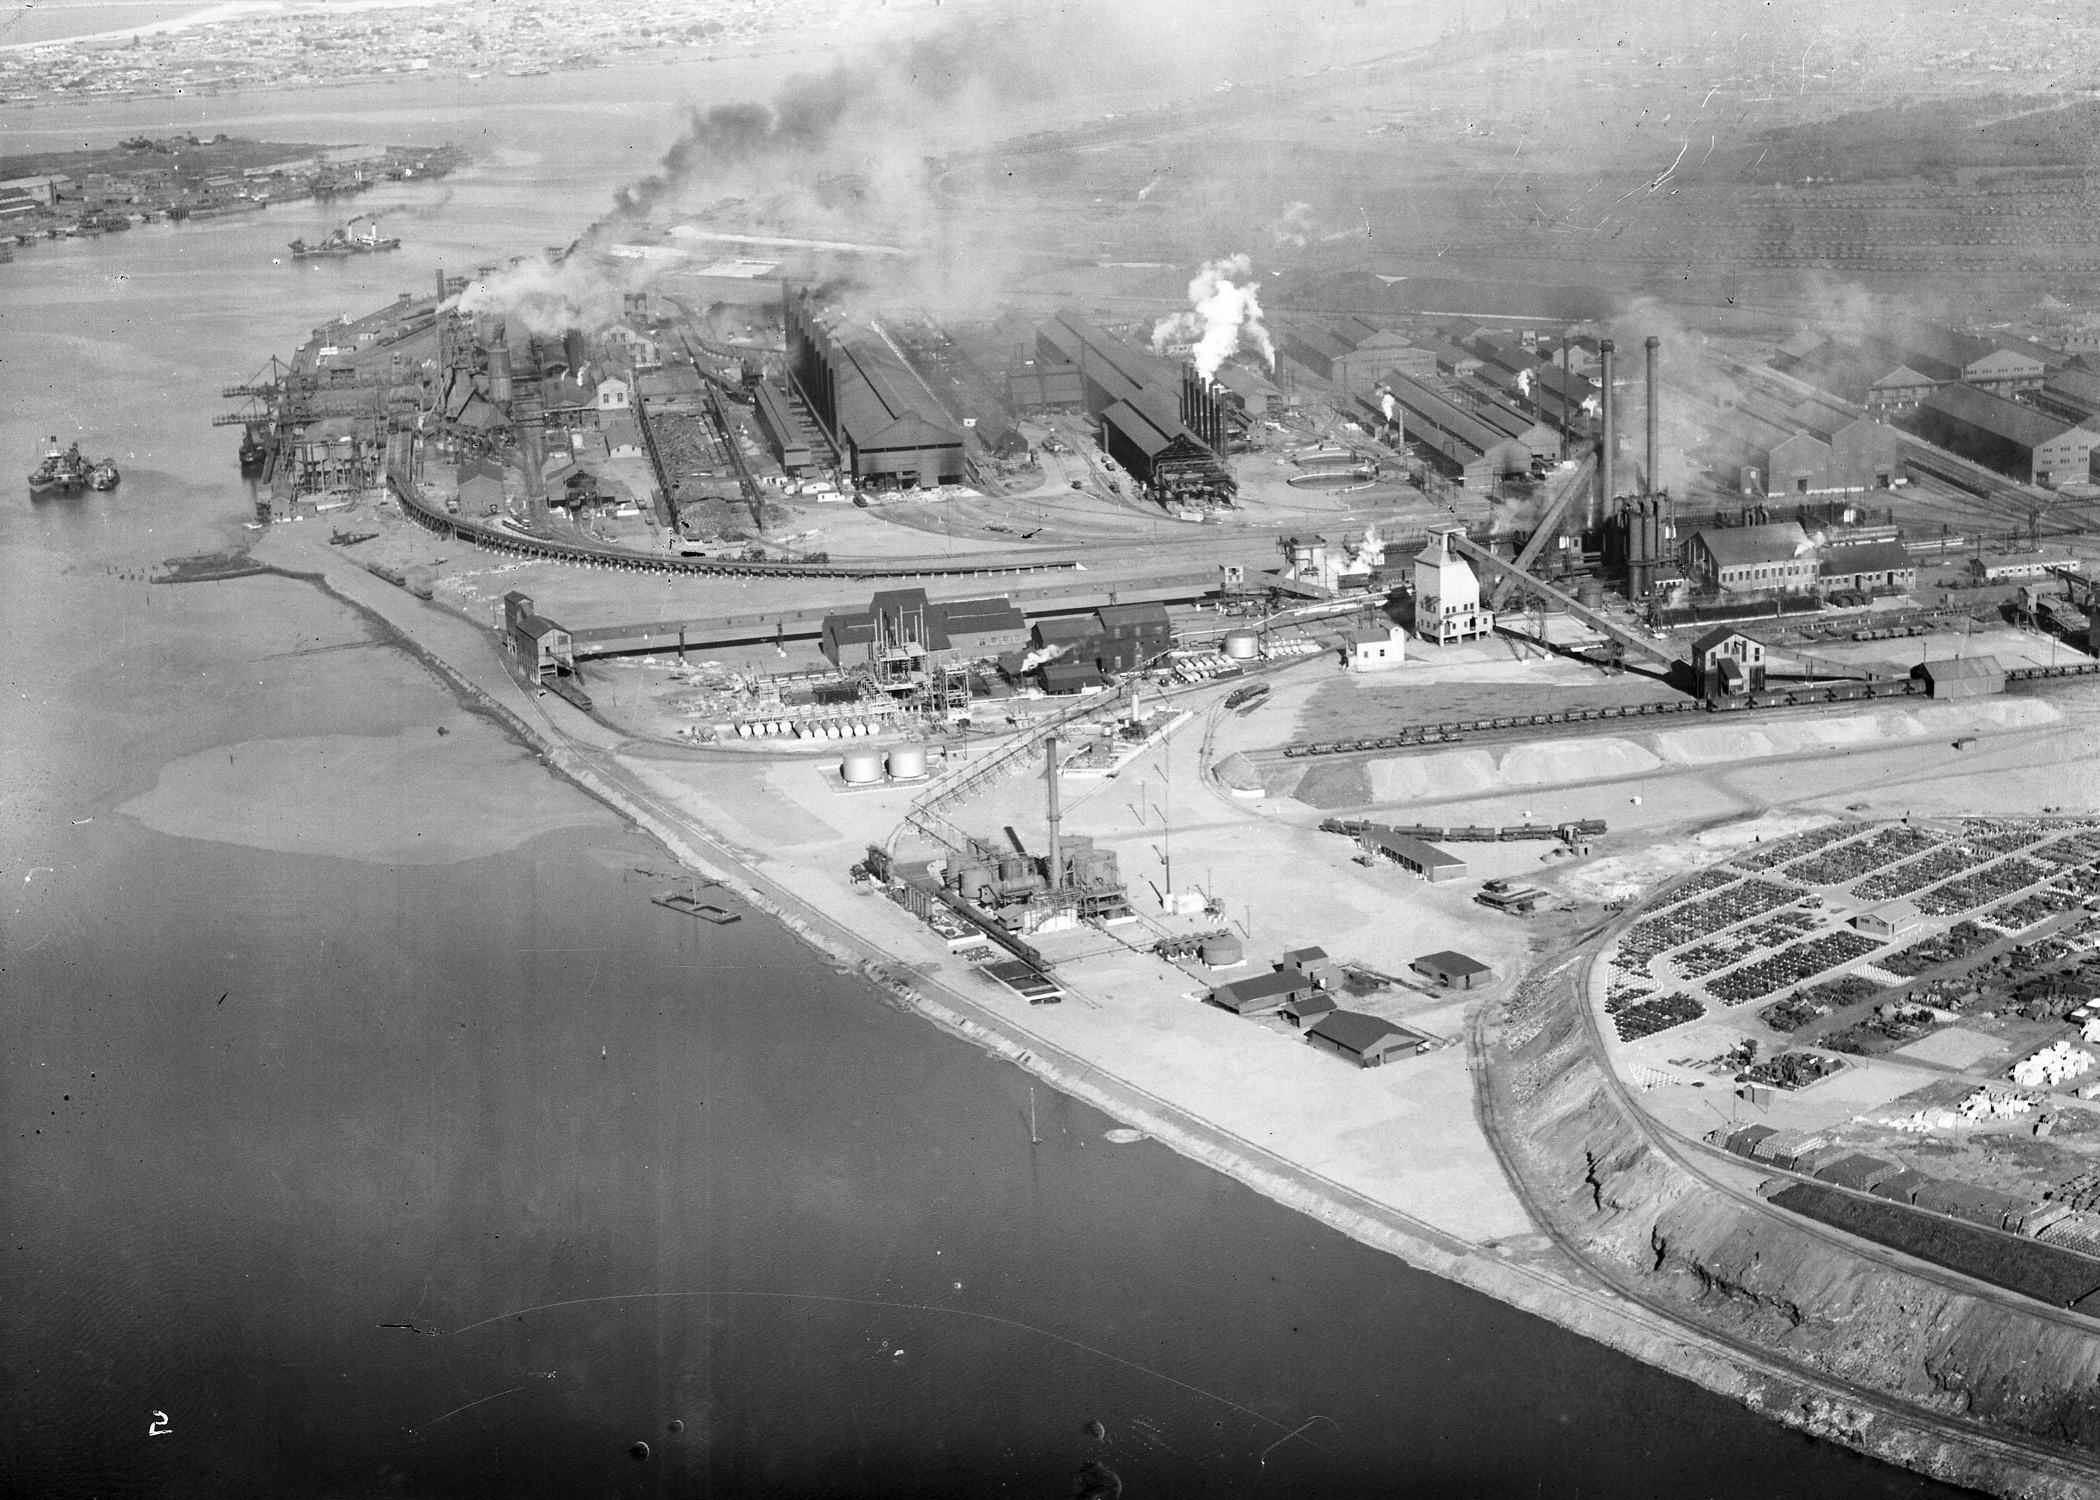 Newcastle aerial, 1935 (Image 63 Courtesy of Phillip Warren)